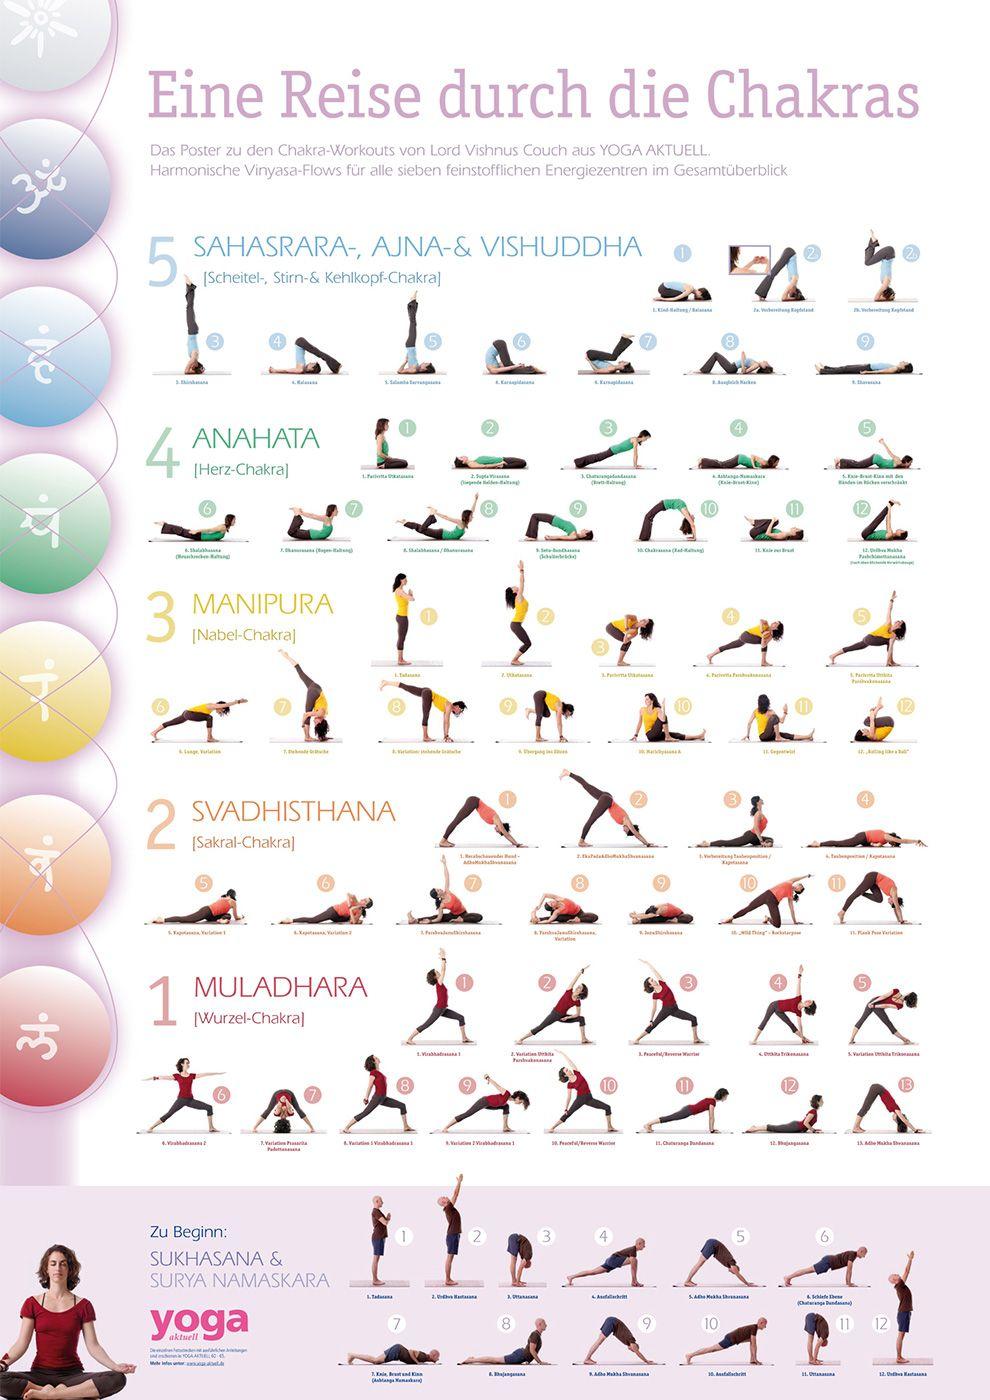 Chakra-Workout-Poster | Yoga-Zubehör, Yogamatten Und Yoga Chakra-Workout-Poster | Yoga-Zubehör, Yogamatten und Yoga Yoga vinyasa